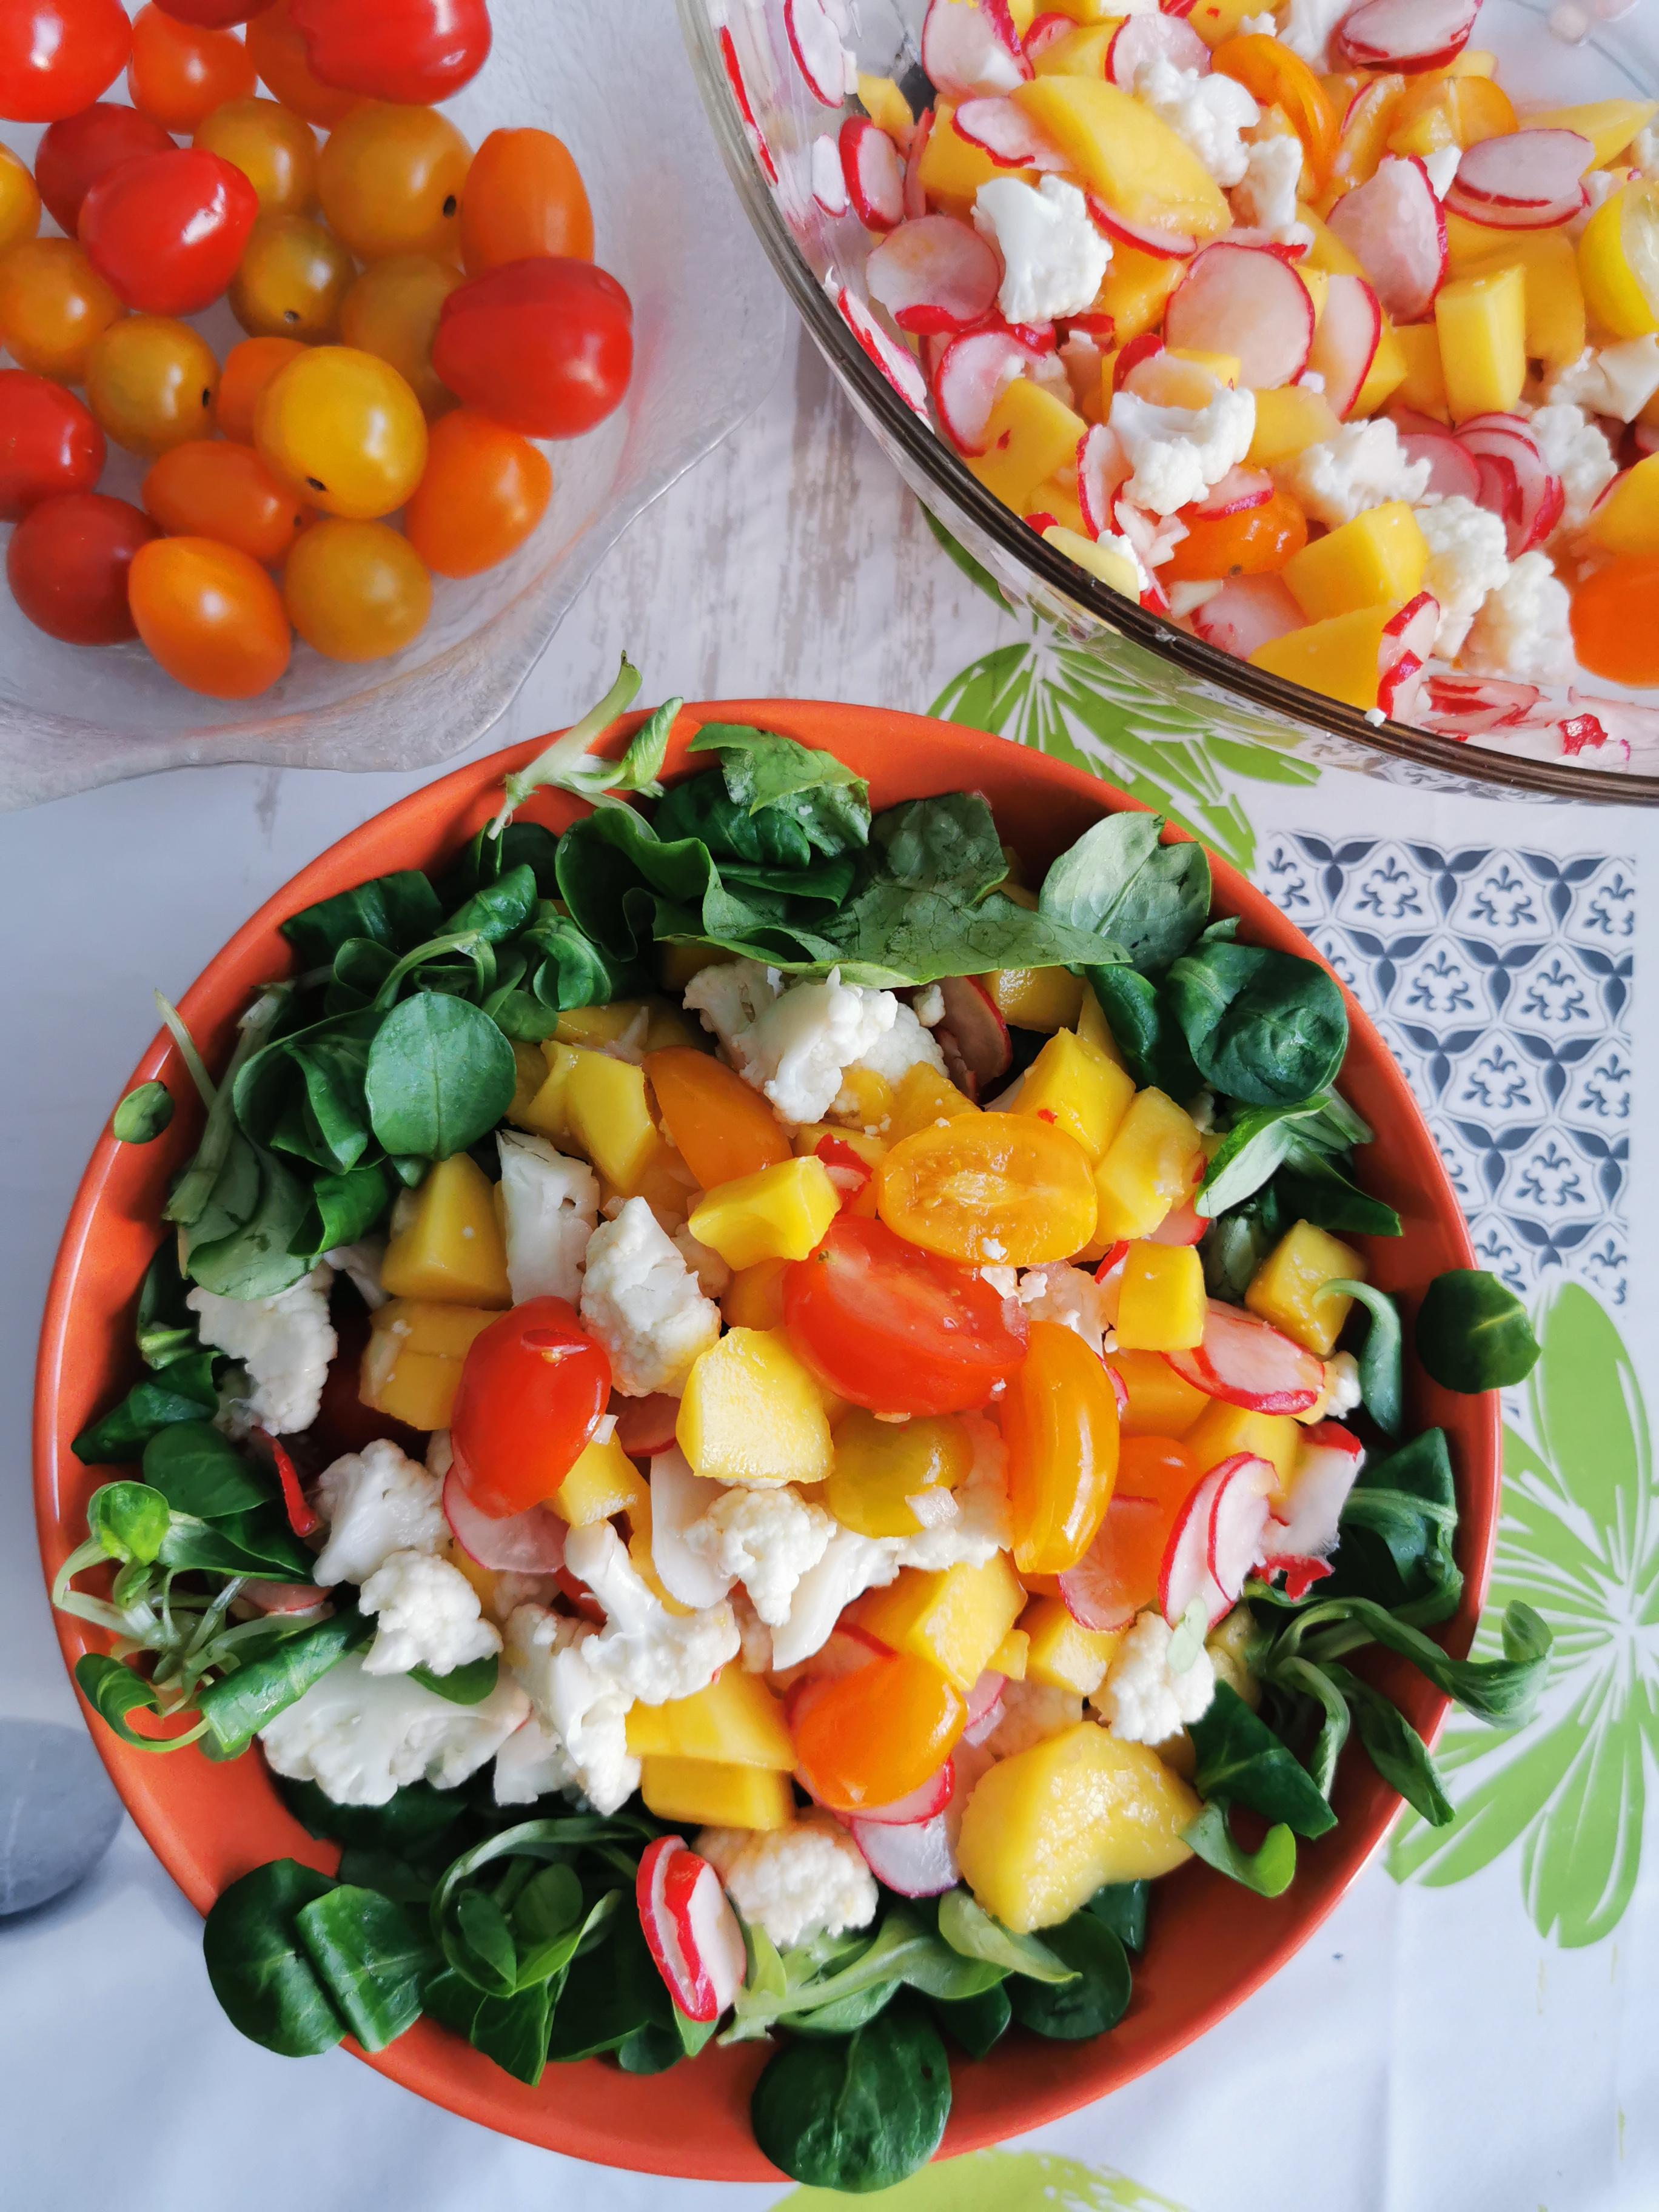 salade de mangue et chou fleur cru vegan et sans gluten médical médium compatible